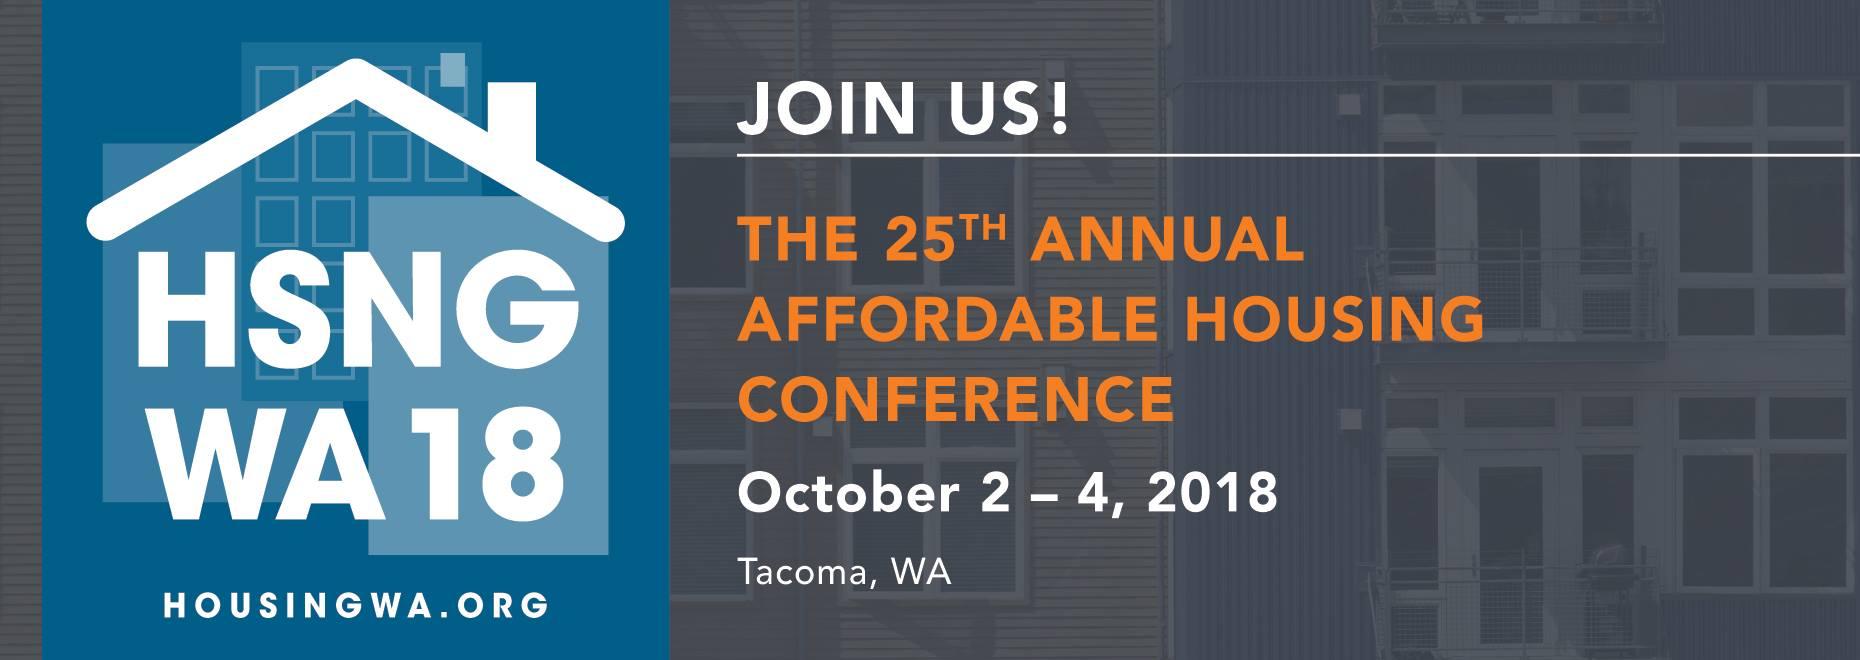 Housing Washington 2018.jpg